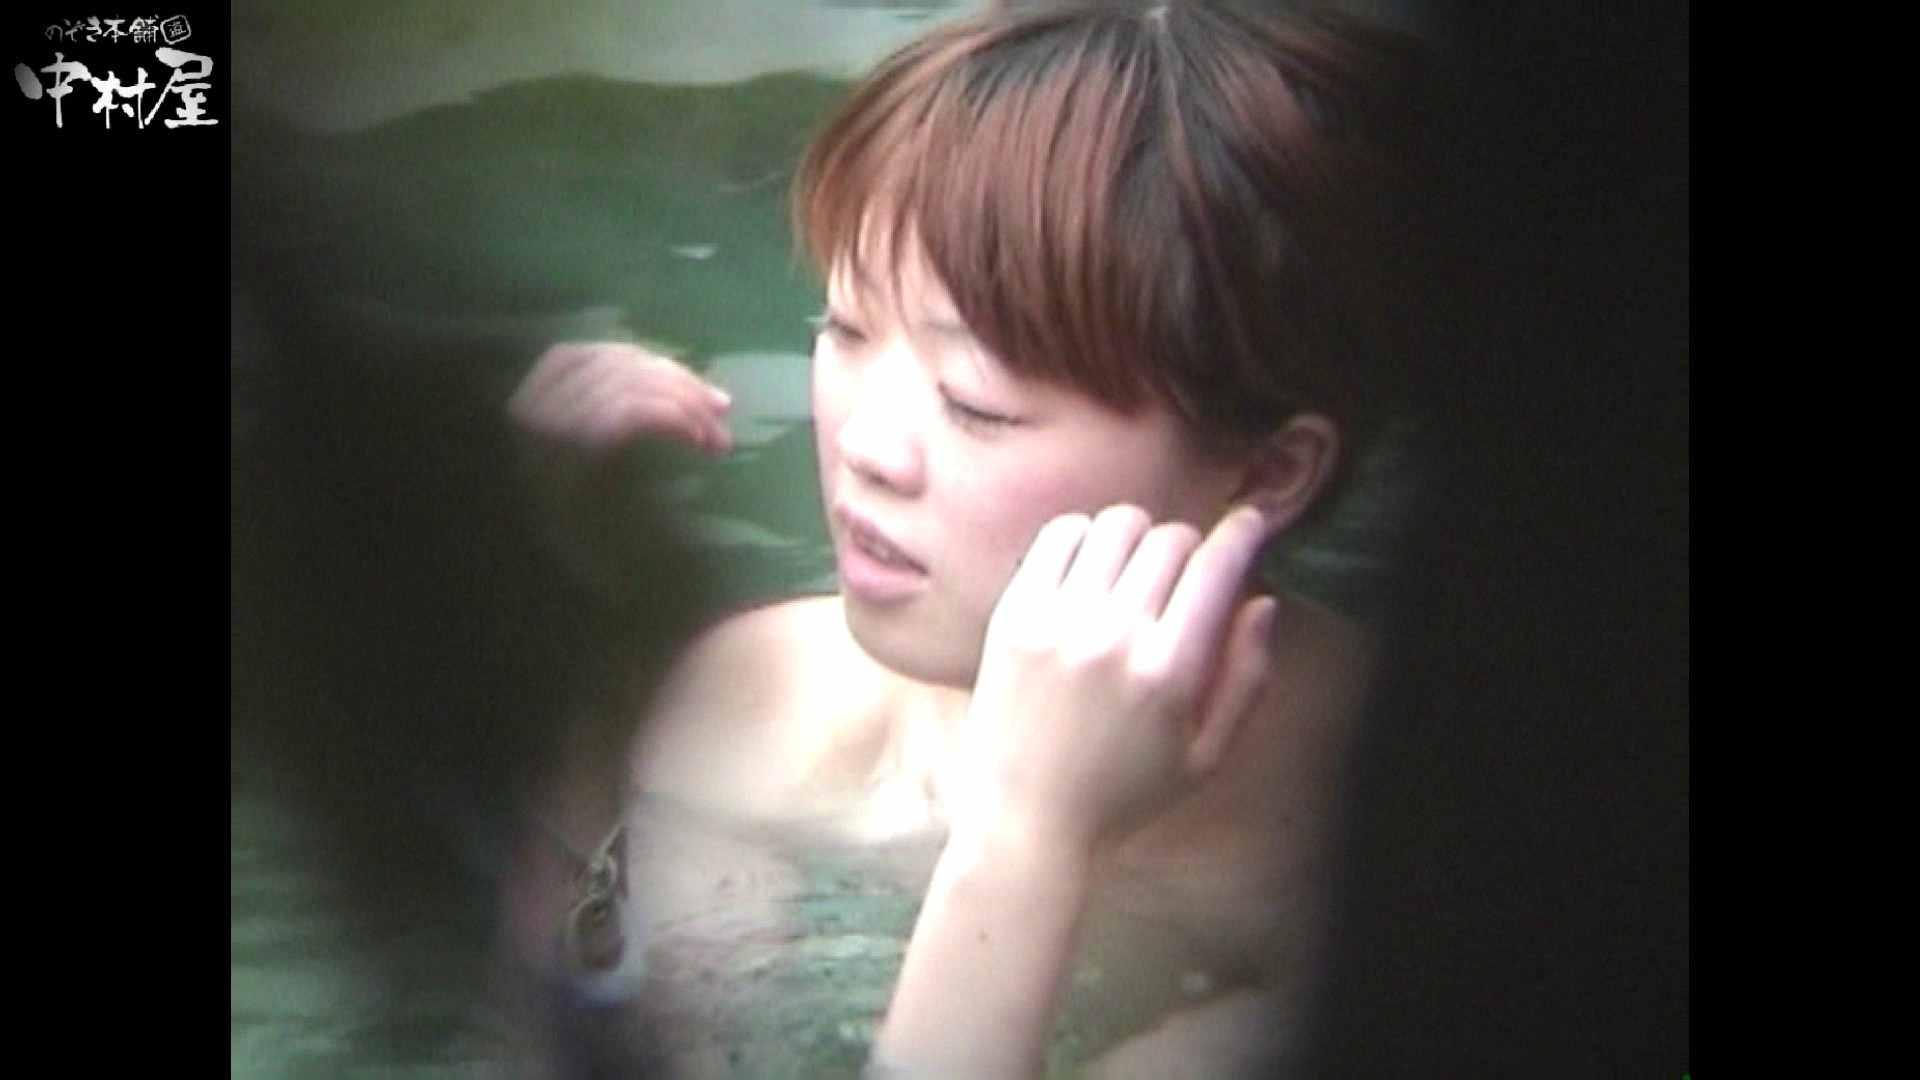 Aquaな露天風呂Vol.954 綺麗なOLたち  54枚 30